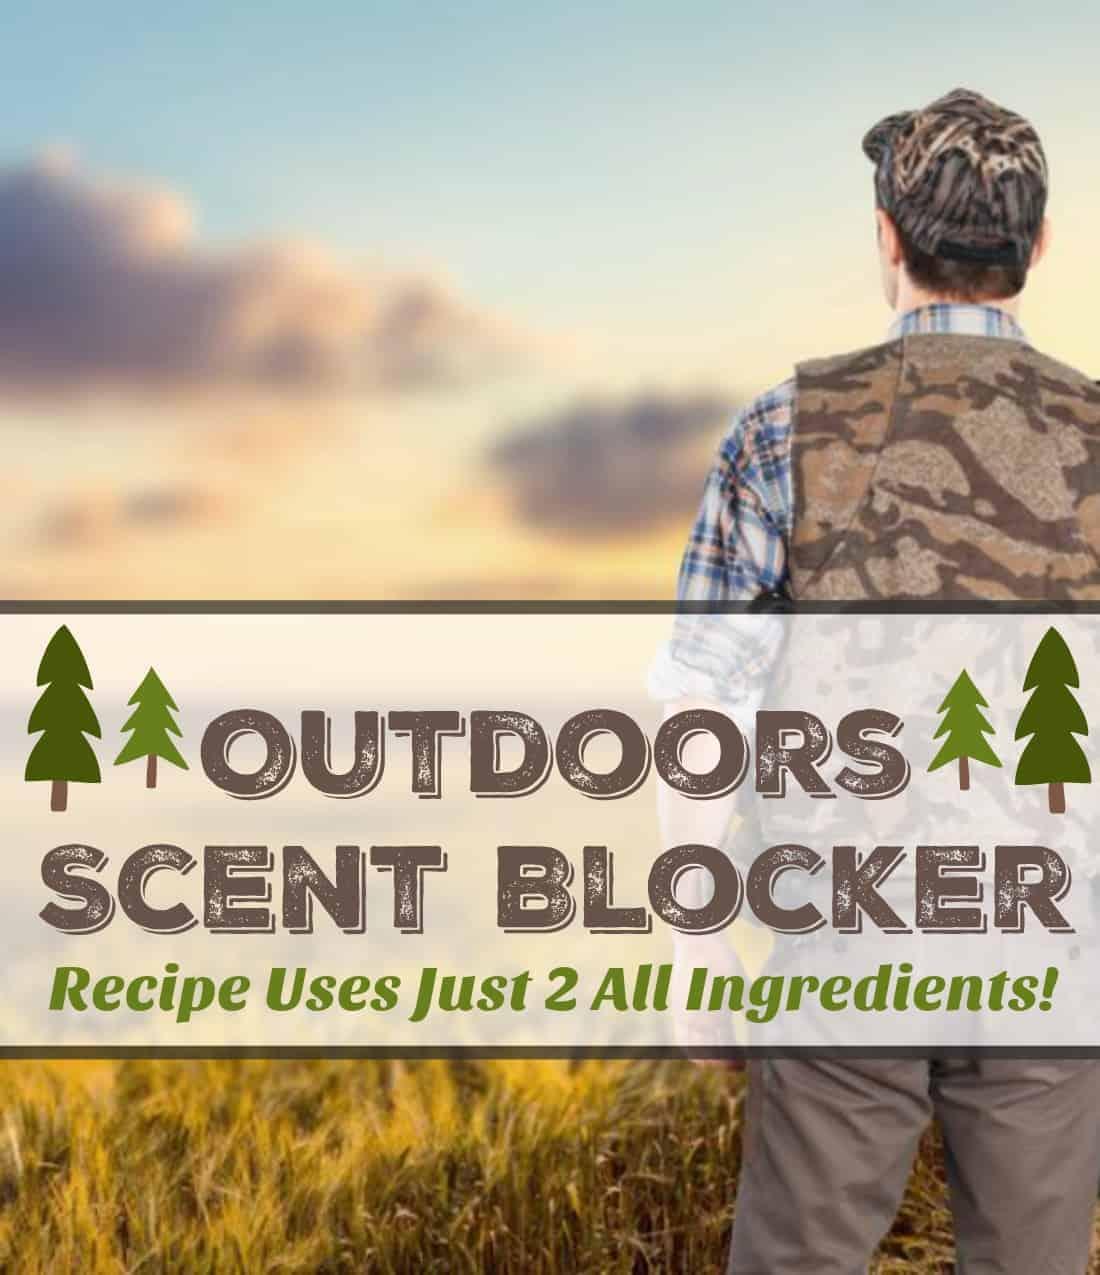 Outdoors scent blocker recipe using 2 ingredients.